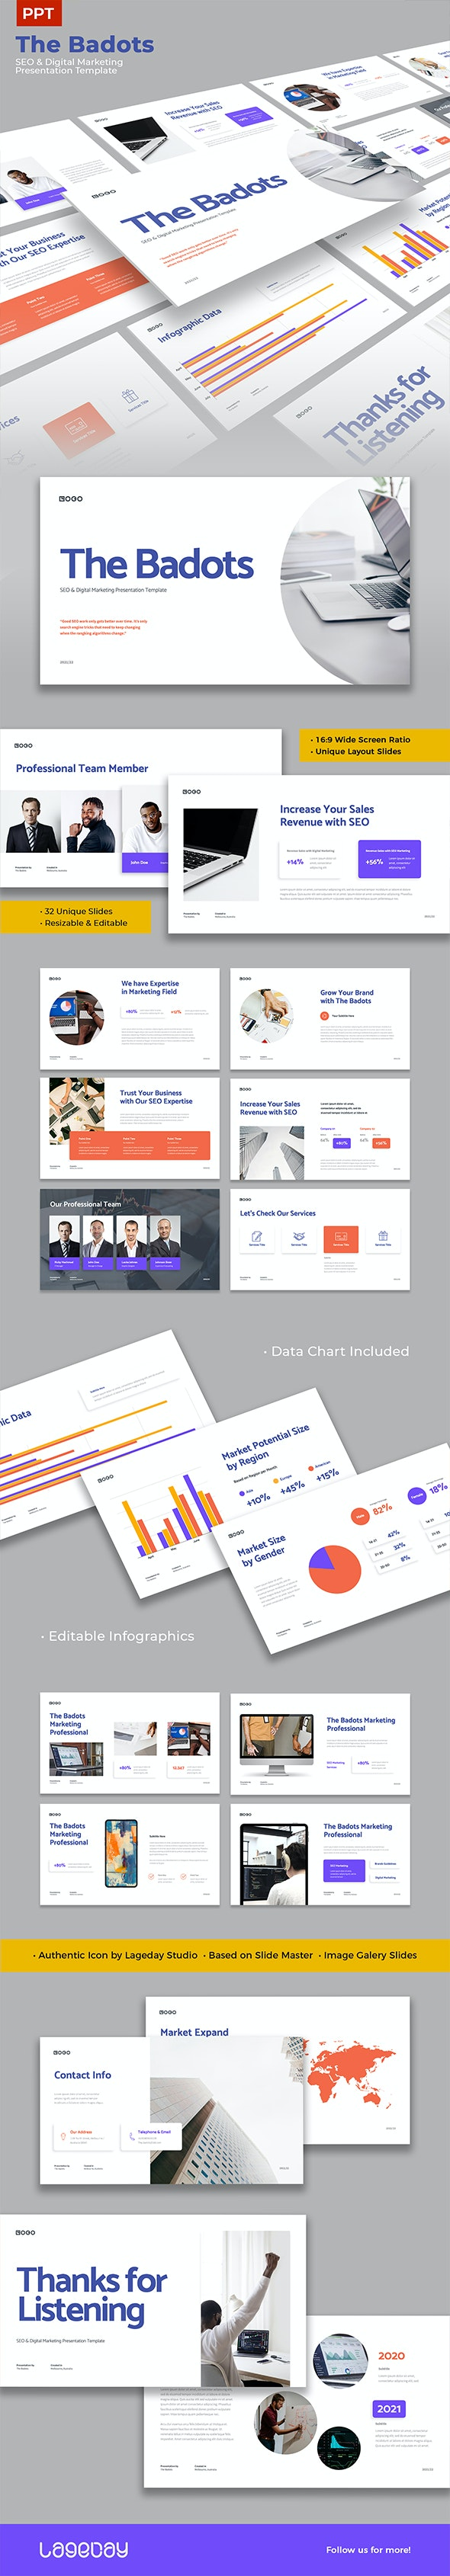 The Badots - SEO & Digital Marketing Presentation PPT Template - PowerPoint Templates Presentation Templates